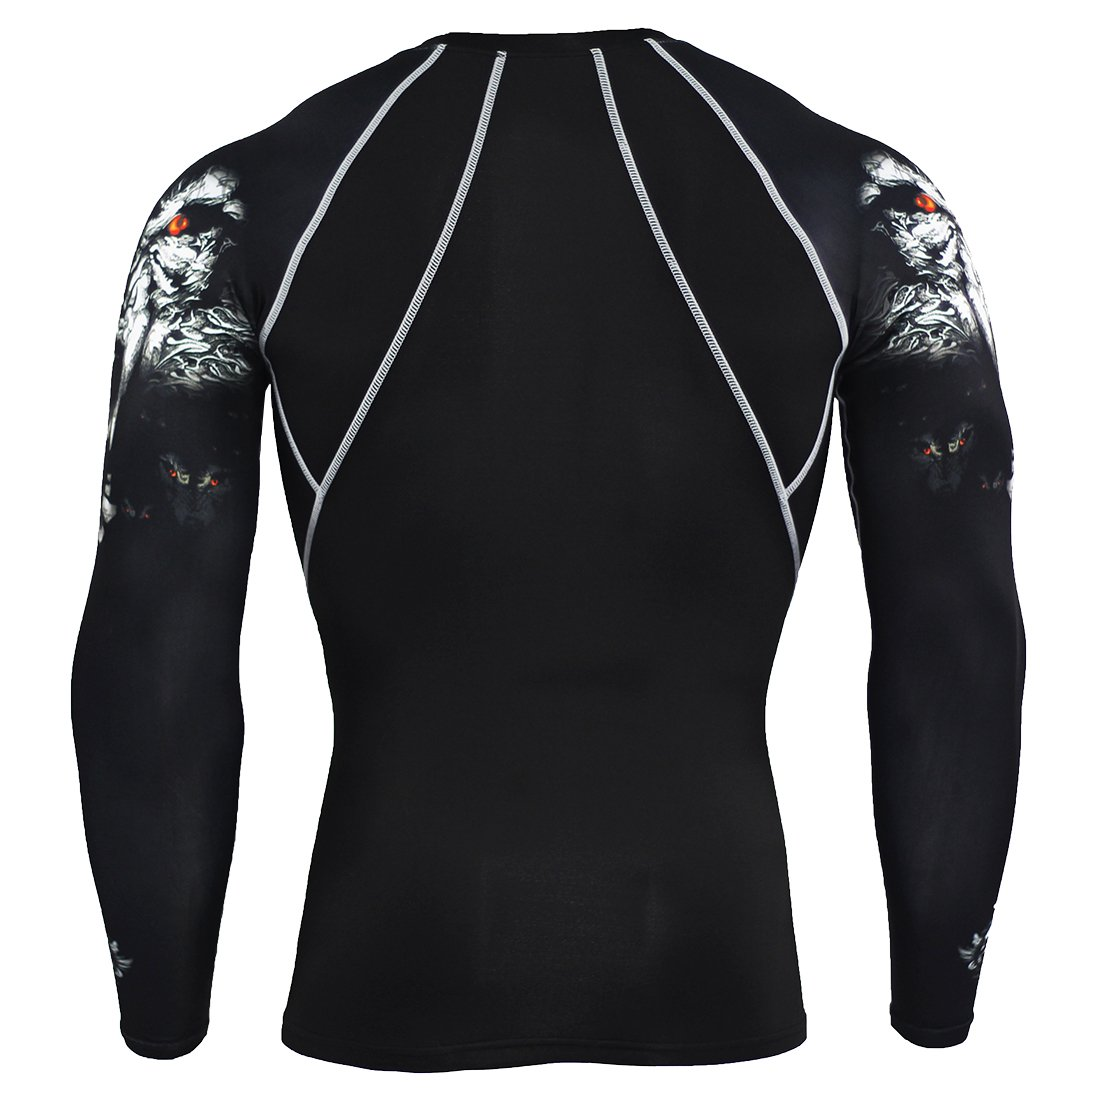 1Bests Men Fitness Compression Tight Skin Shirts MMA Long Sleeves 3D Prints Rashguard Fitness Base Layer T-Shirts